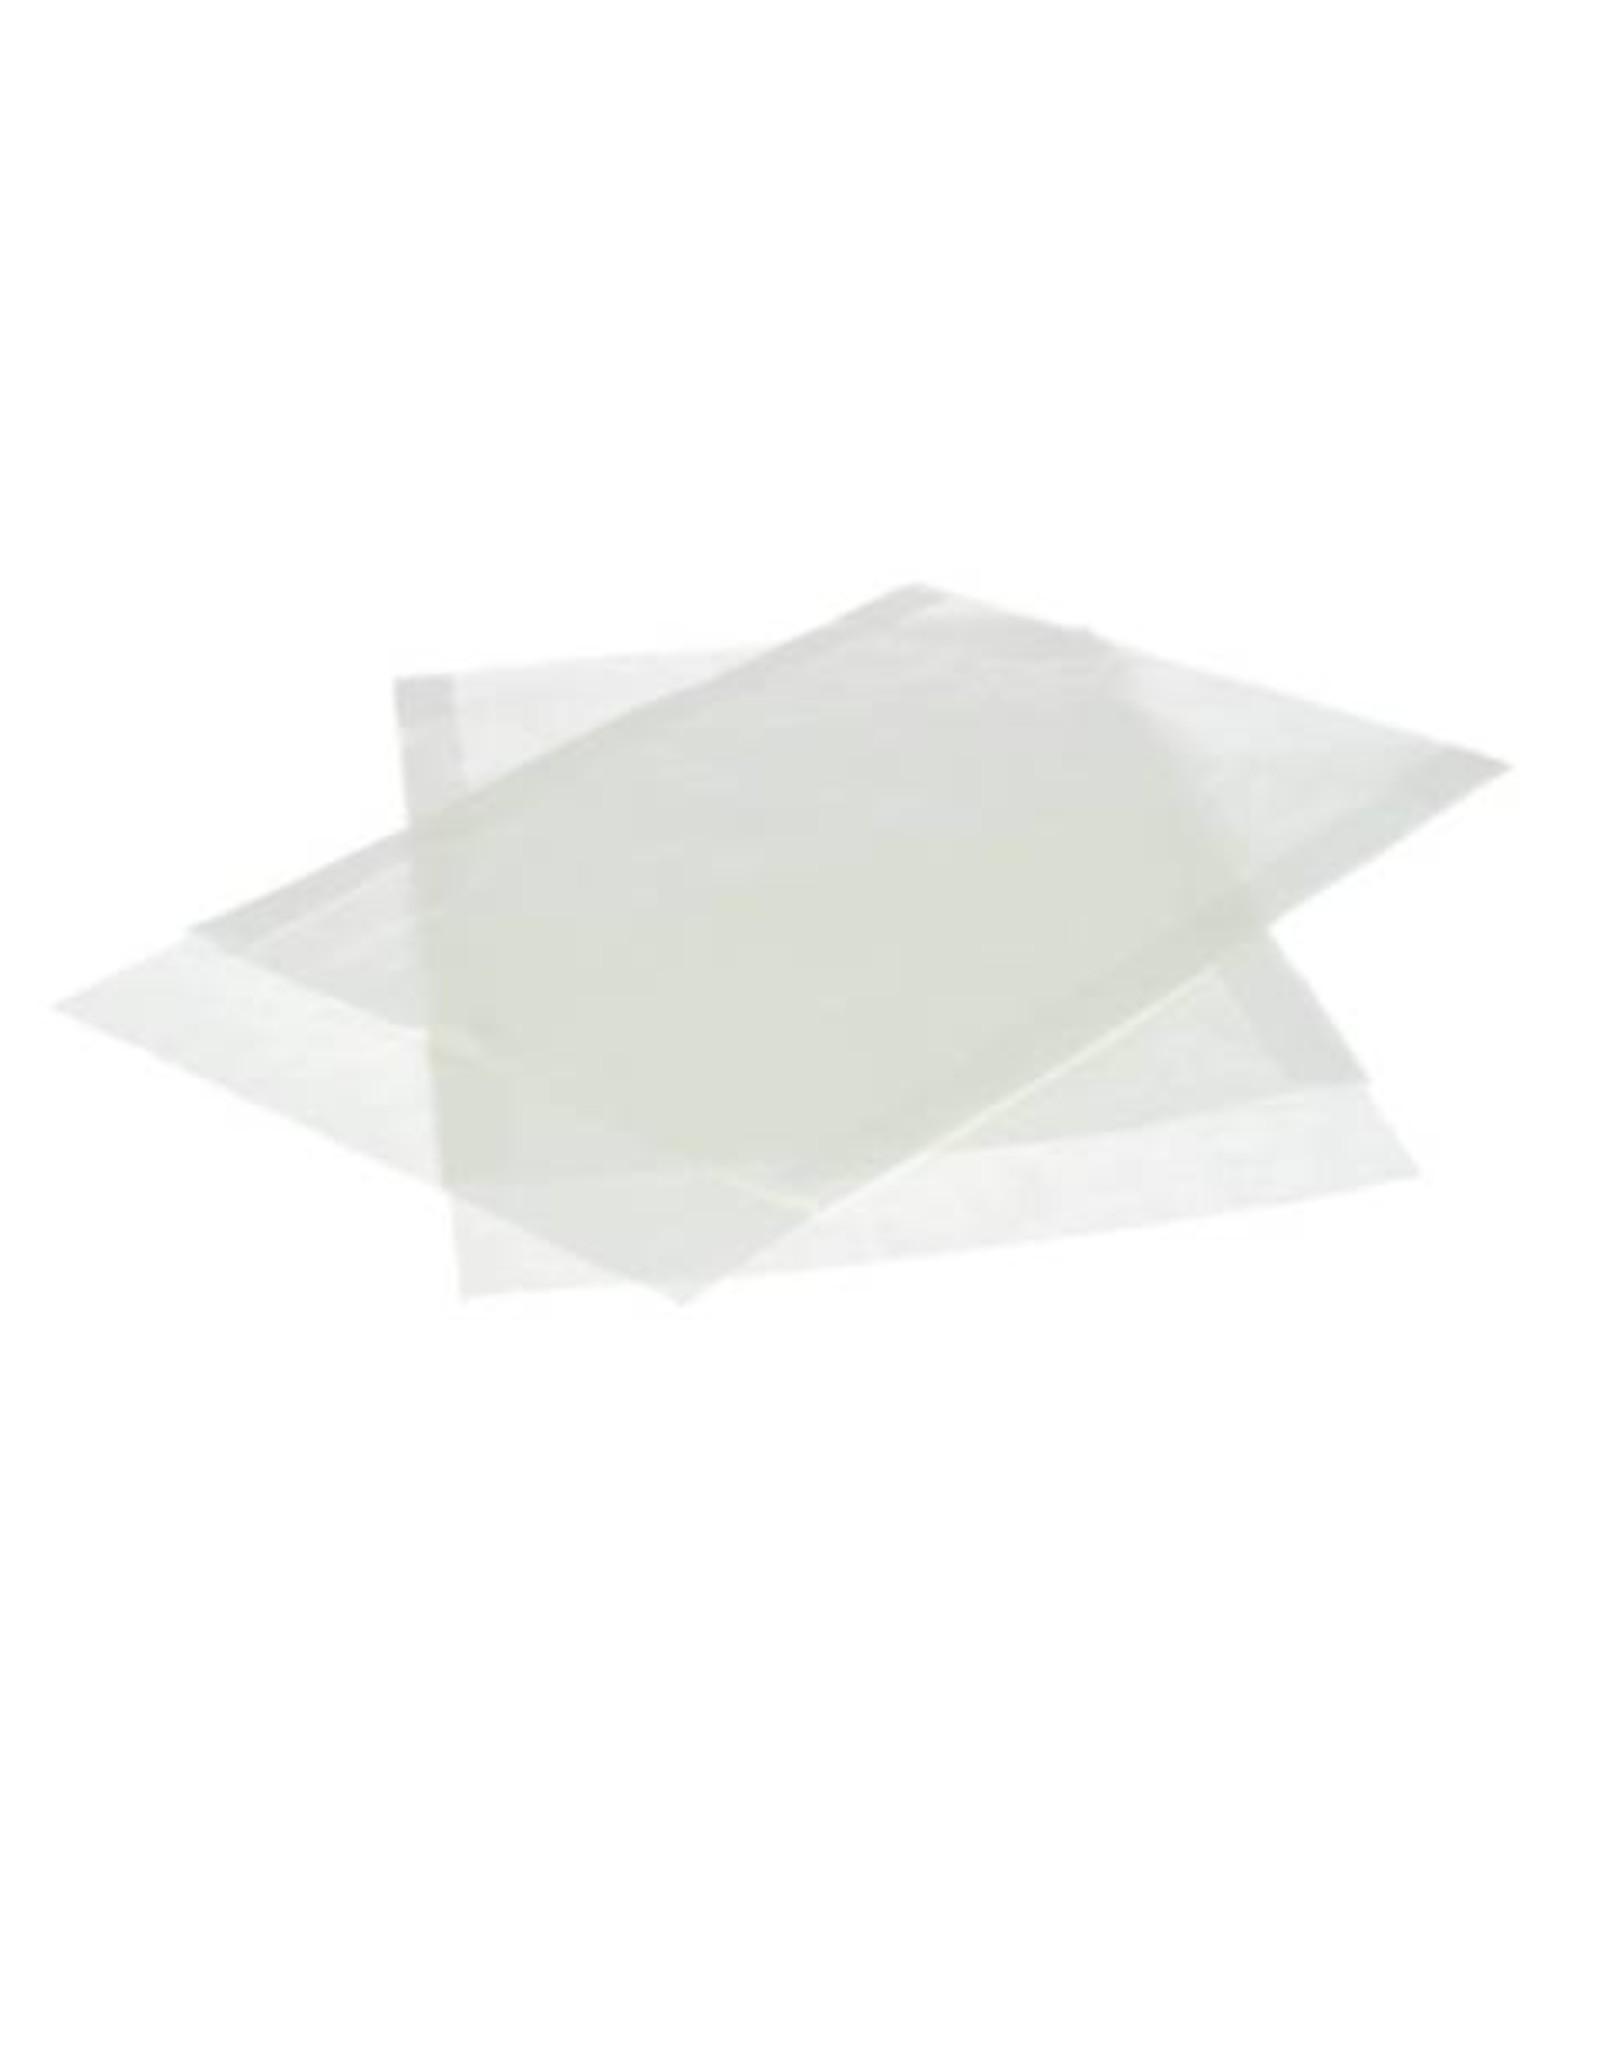 Pergamijn zakjes | 10 stuks